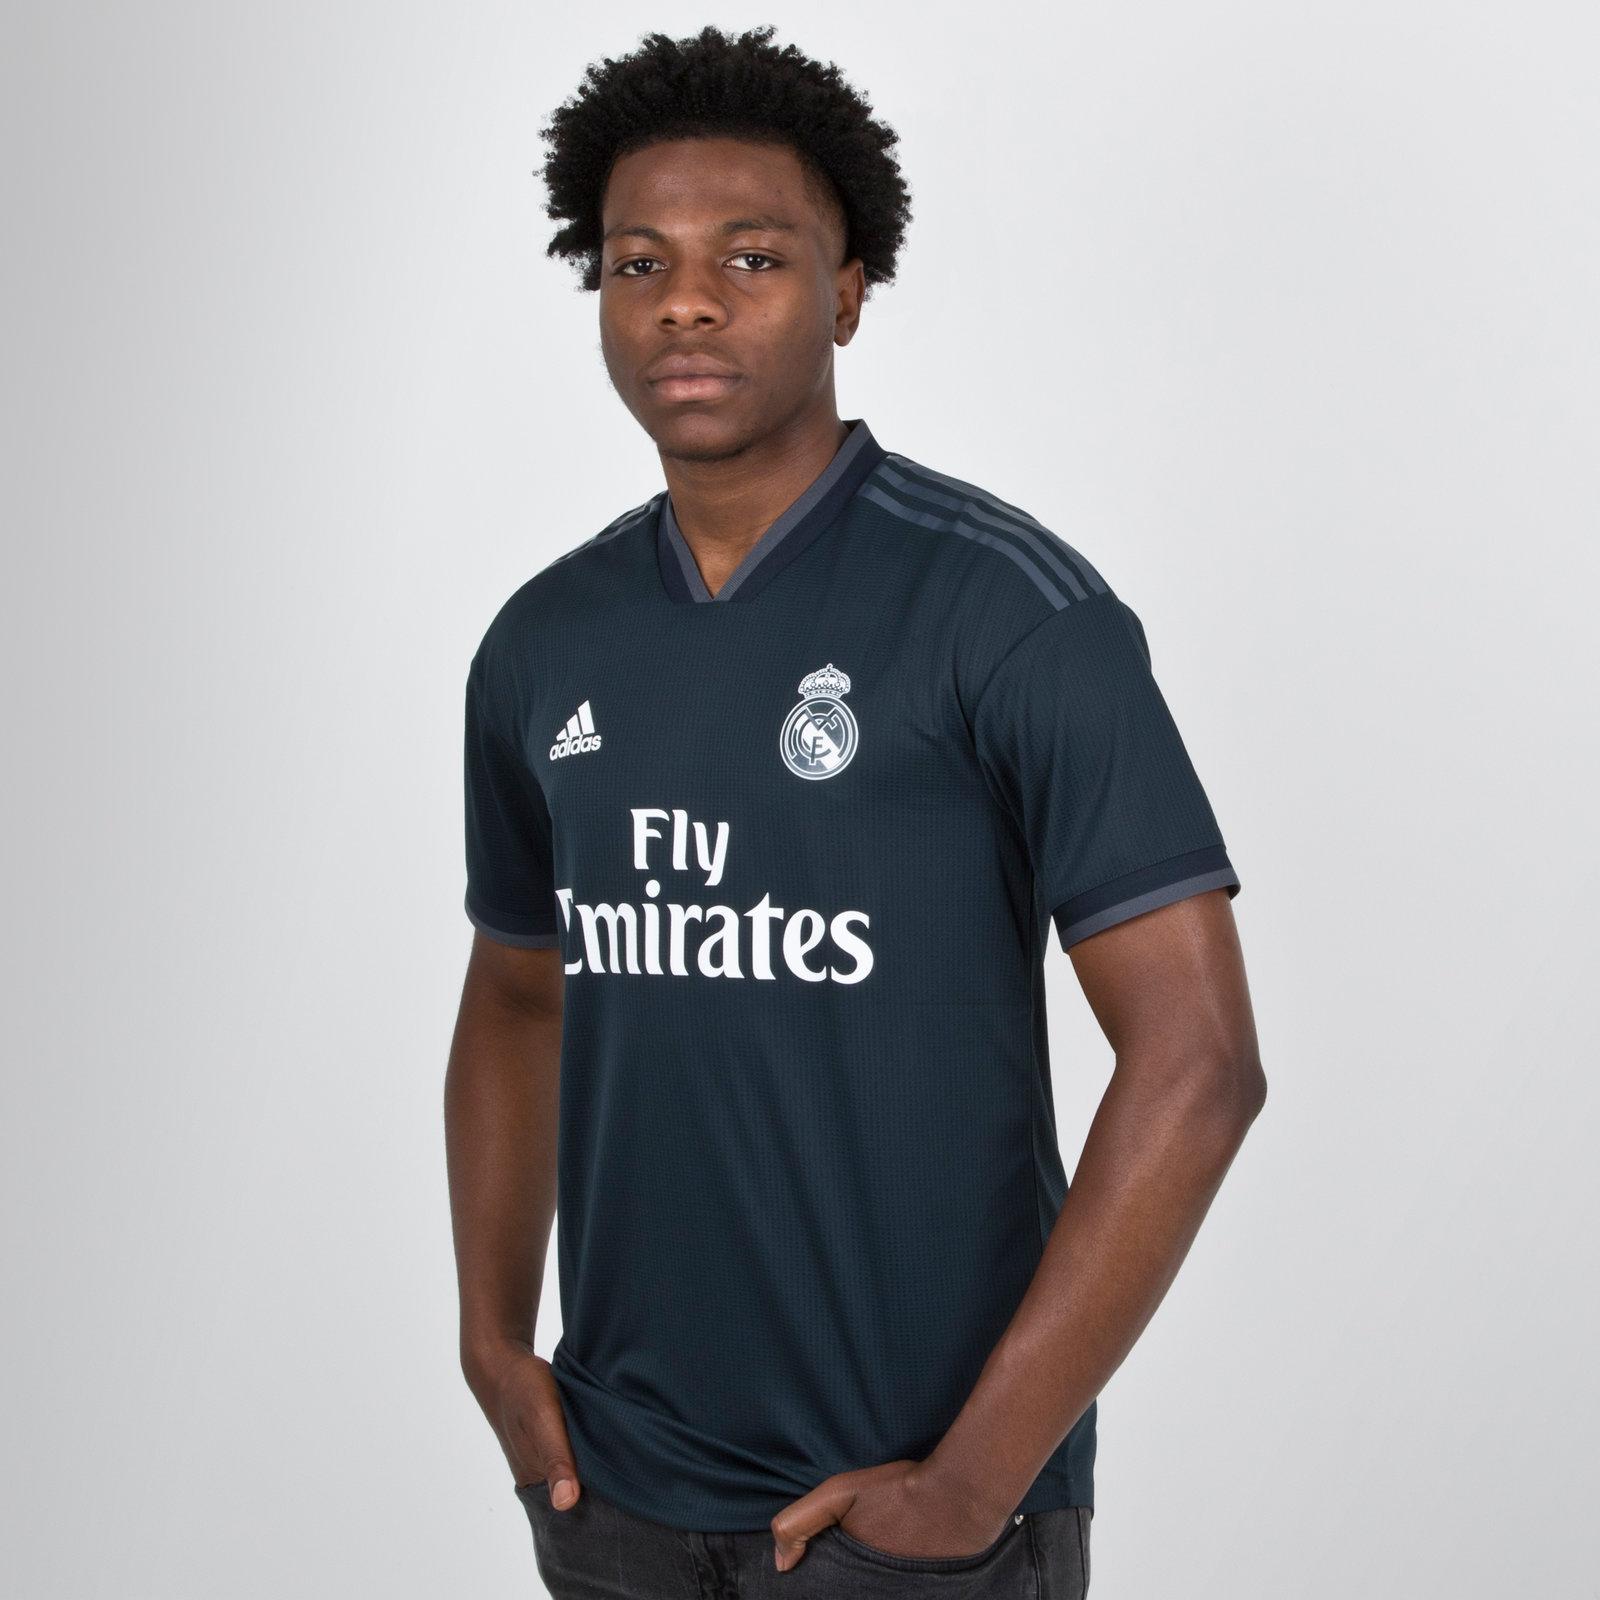 856531e68 adidas Mens Real Madrid FC 18 19 Away Authentic Short Sleeve Football Shirt